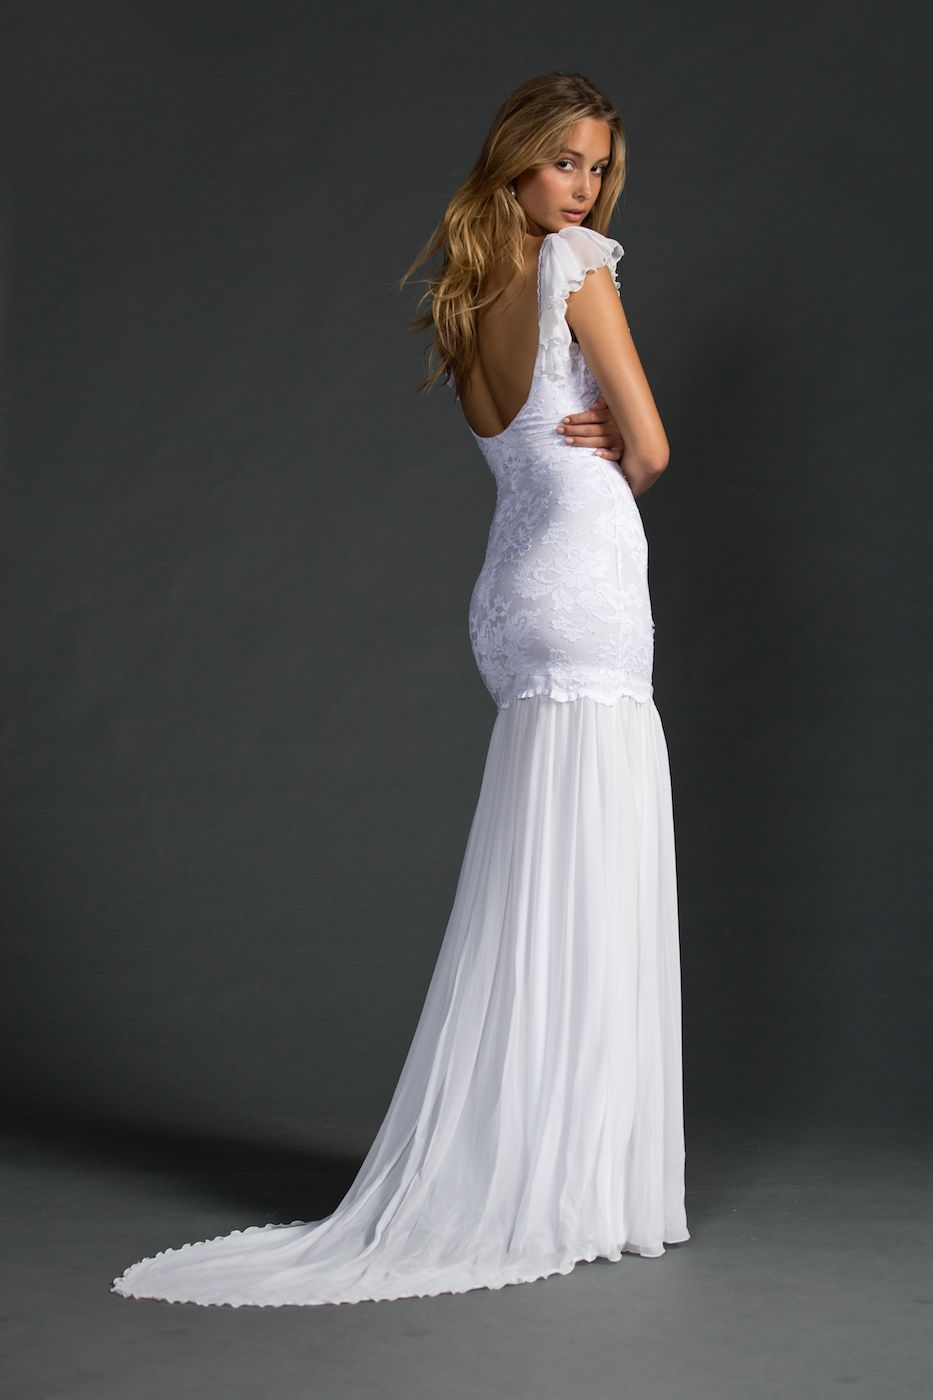 Madeline Wedding dress sleeves, 2nd wedding dresses, Buy